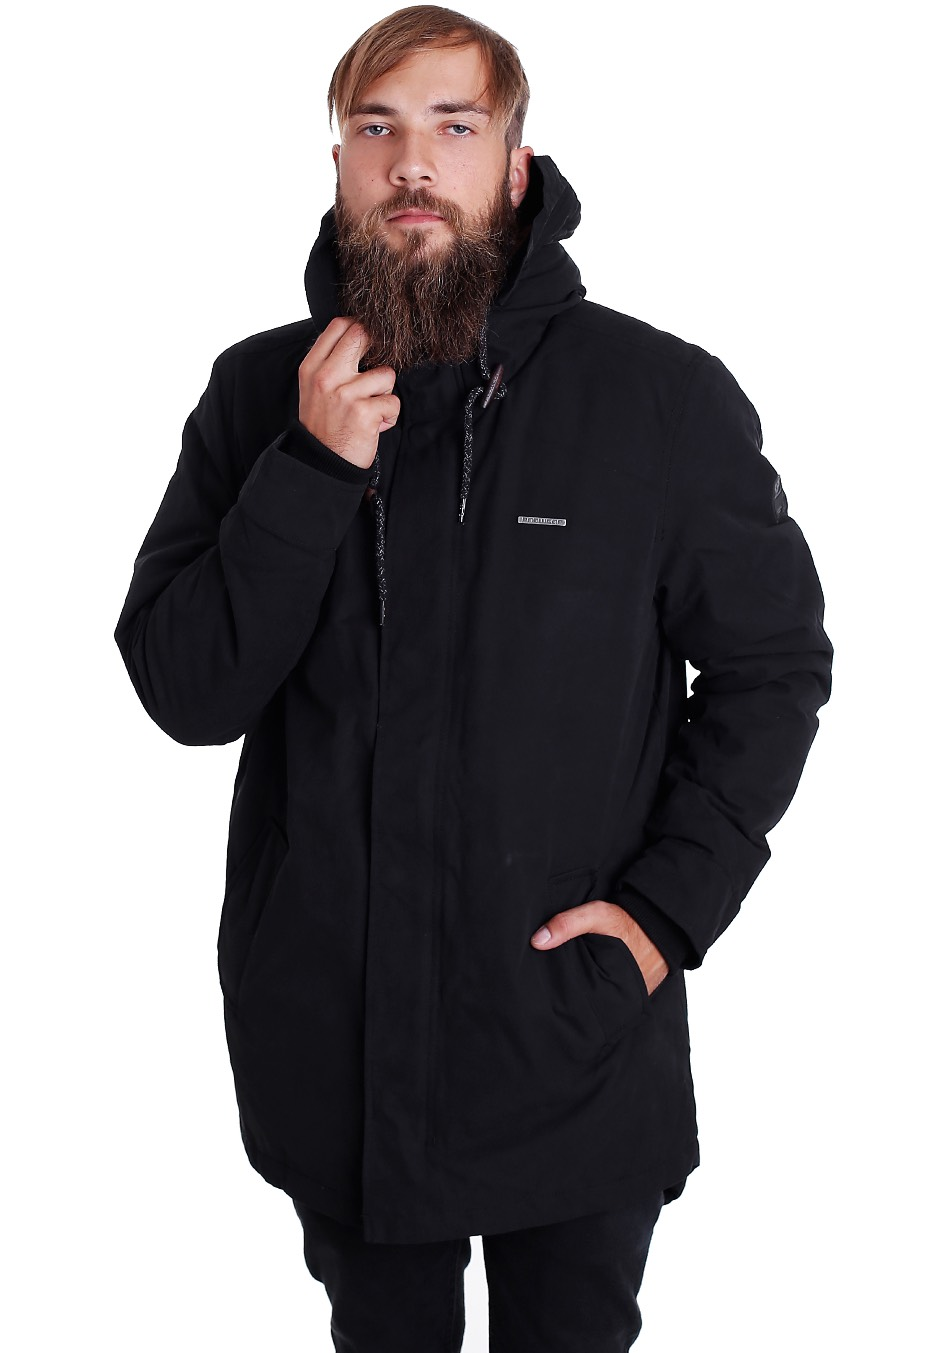 ragwear mr smith jacket streetwear shop uk. Black Bedroom Furniture Sets. Home Design Ideas